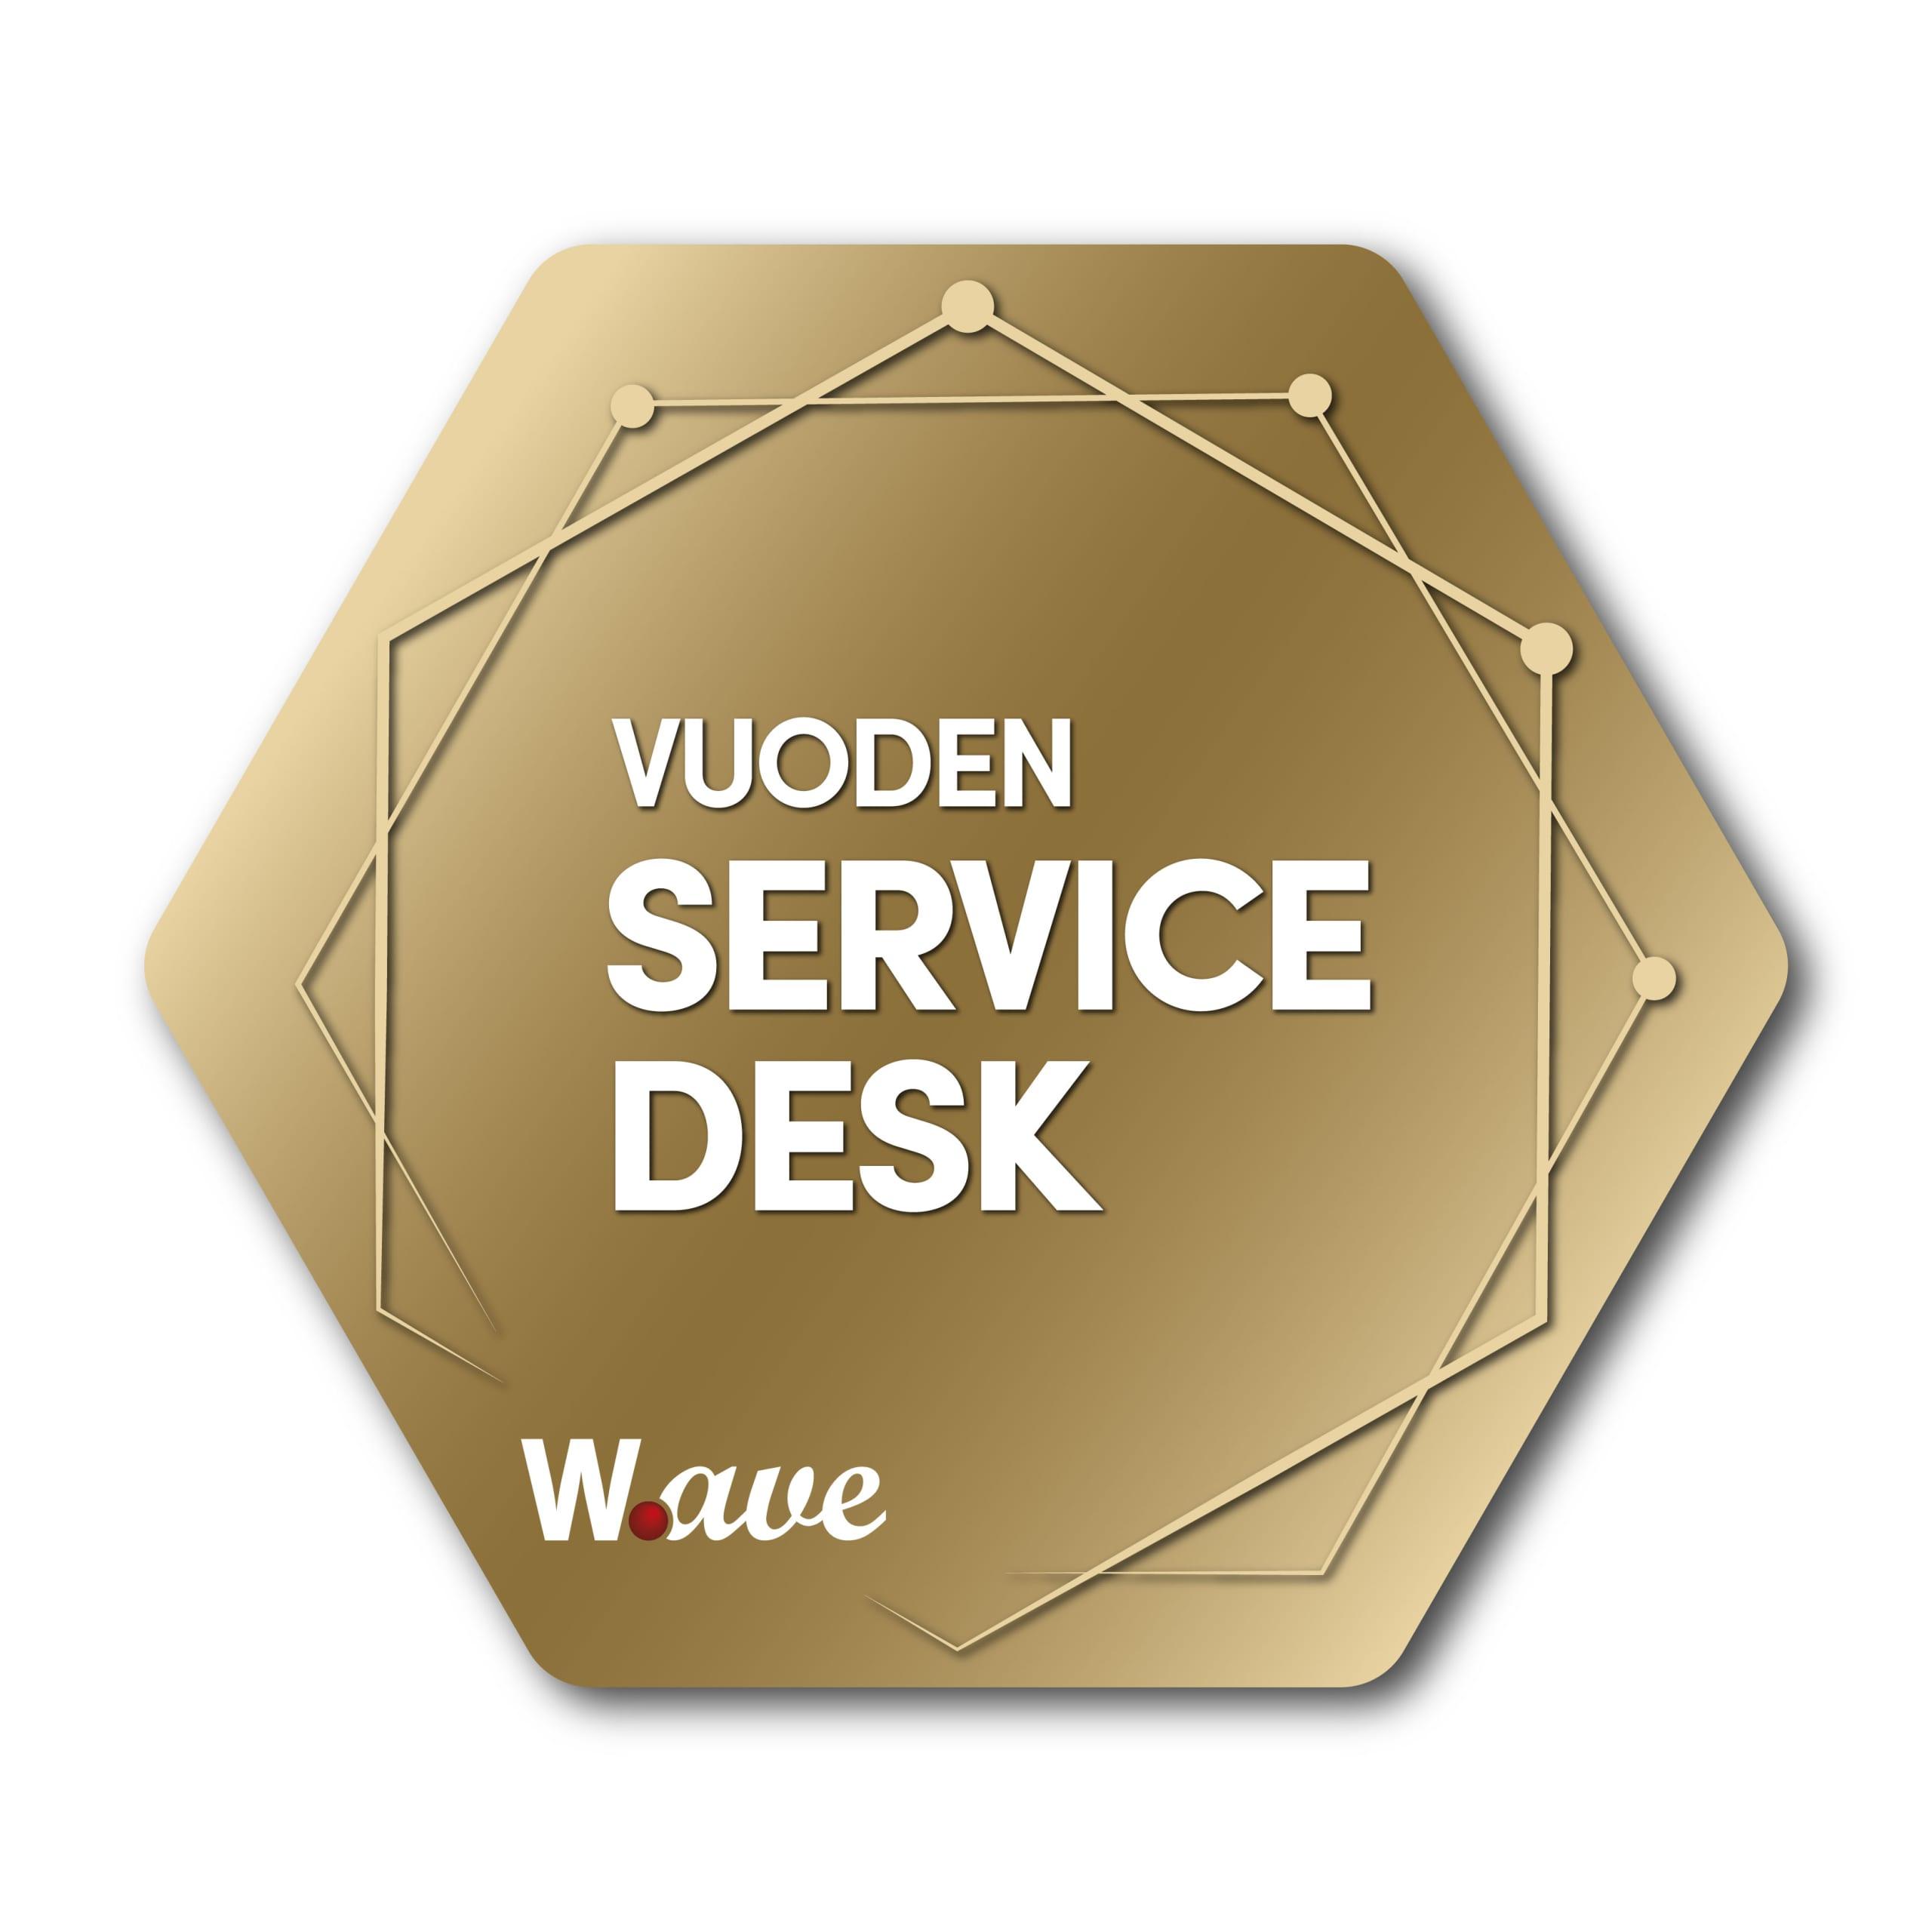 Vuoden Service Desk